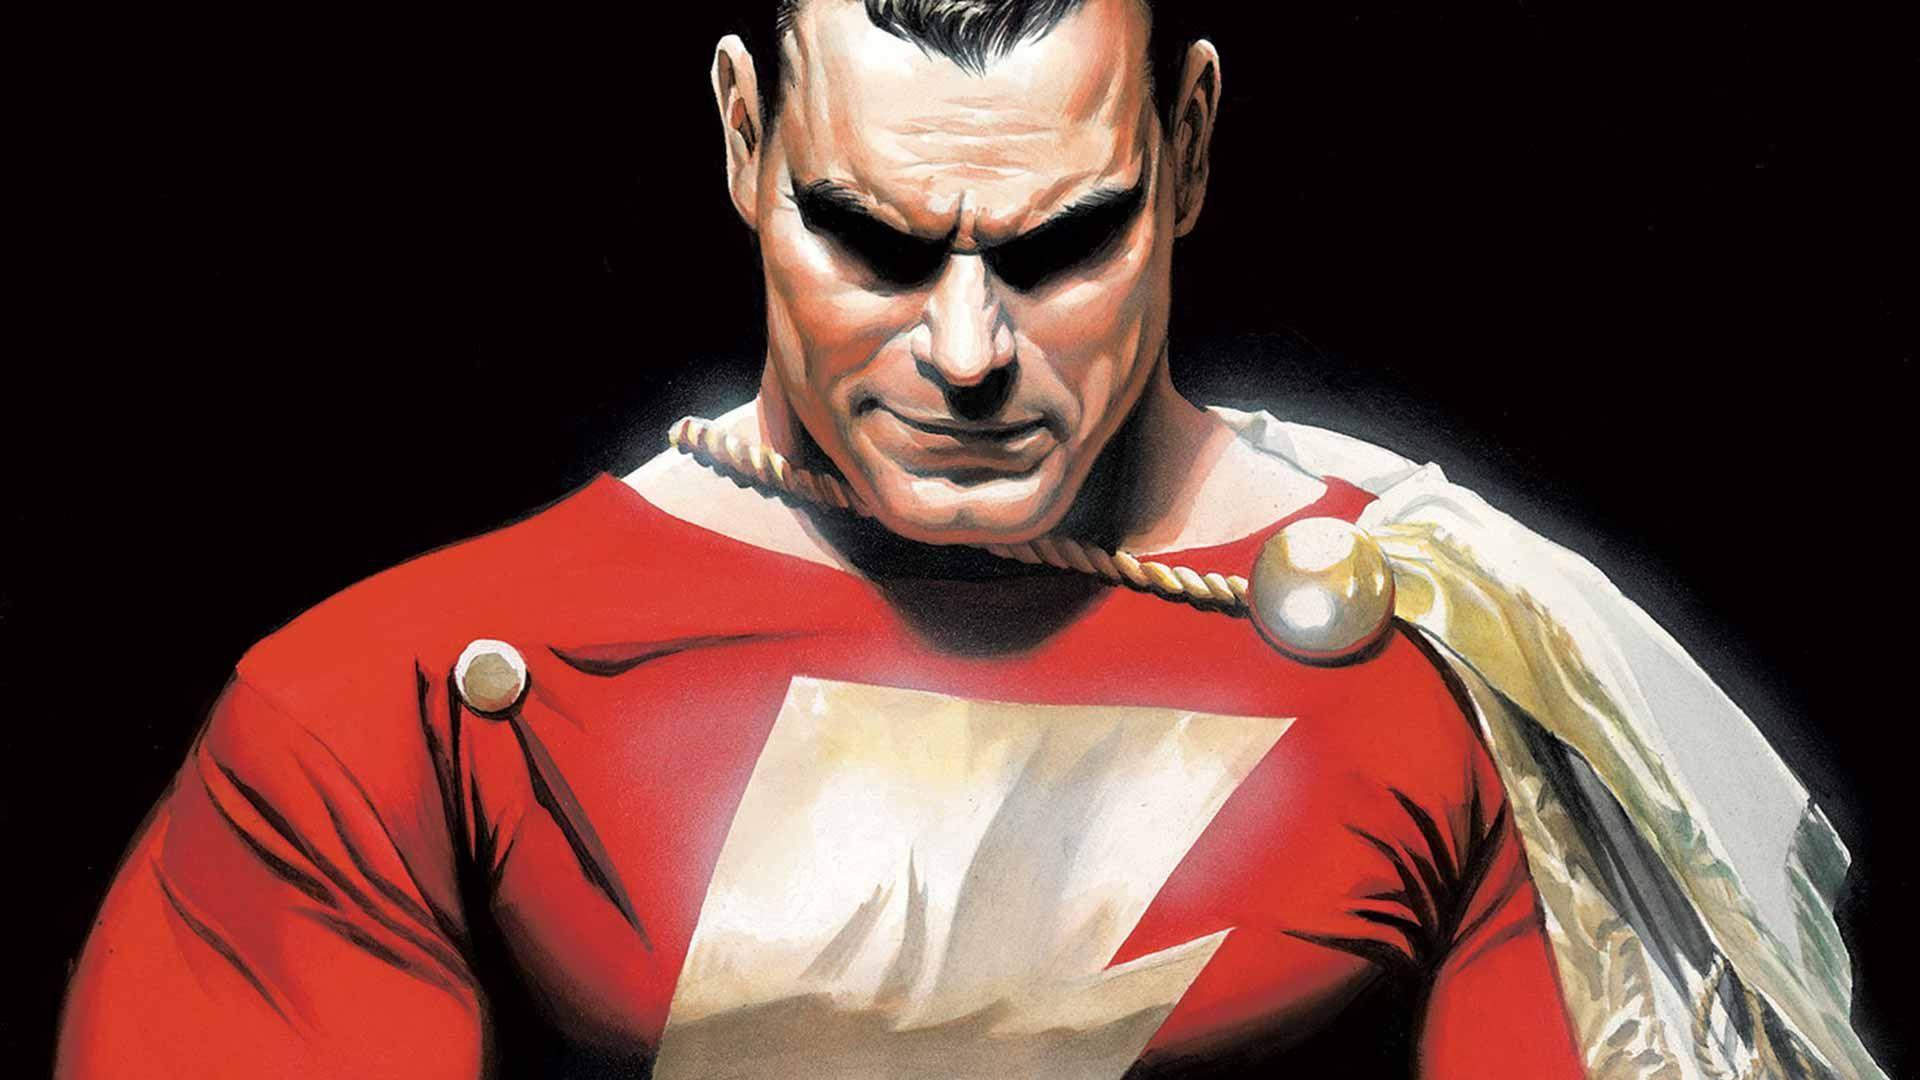 Exclusive: How 'Shazam!' Movie Will Build on Warner Bros.' Recent DC Comics Misfires